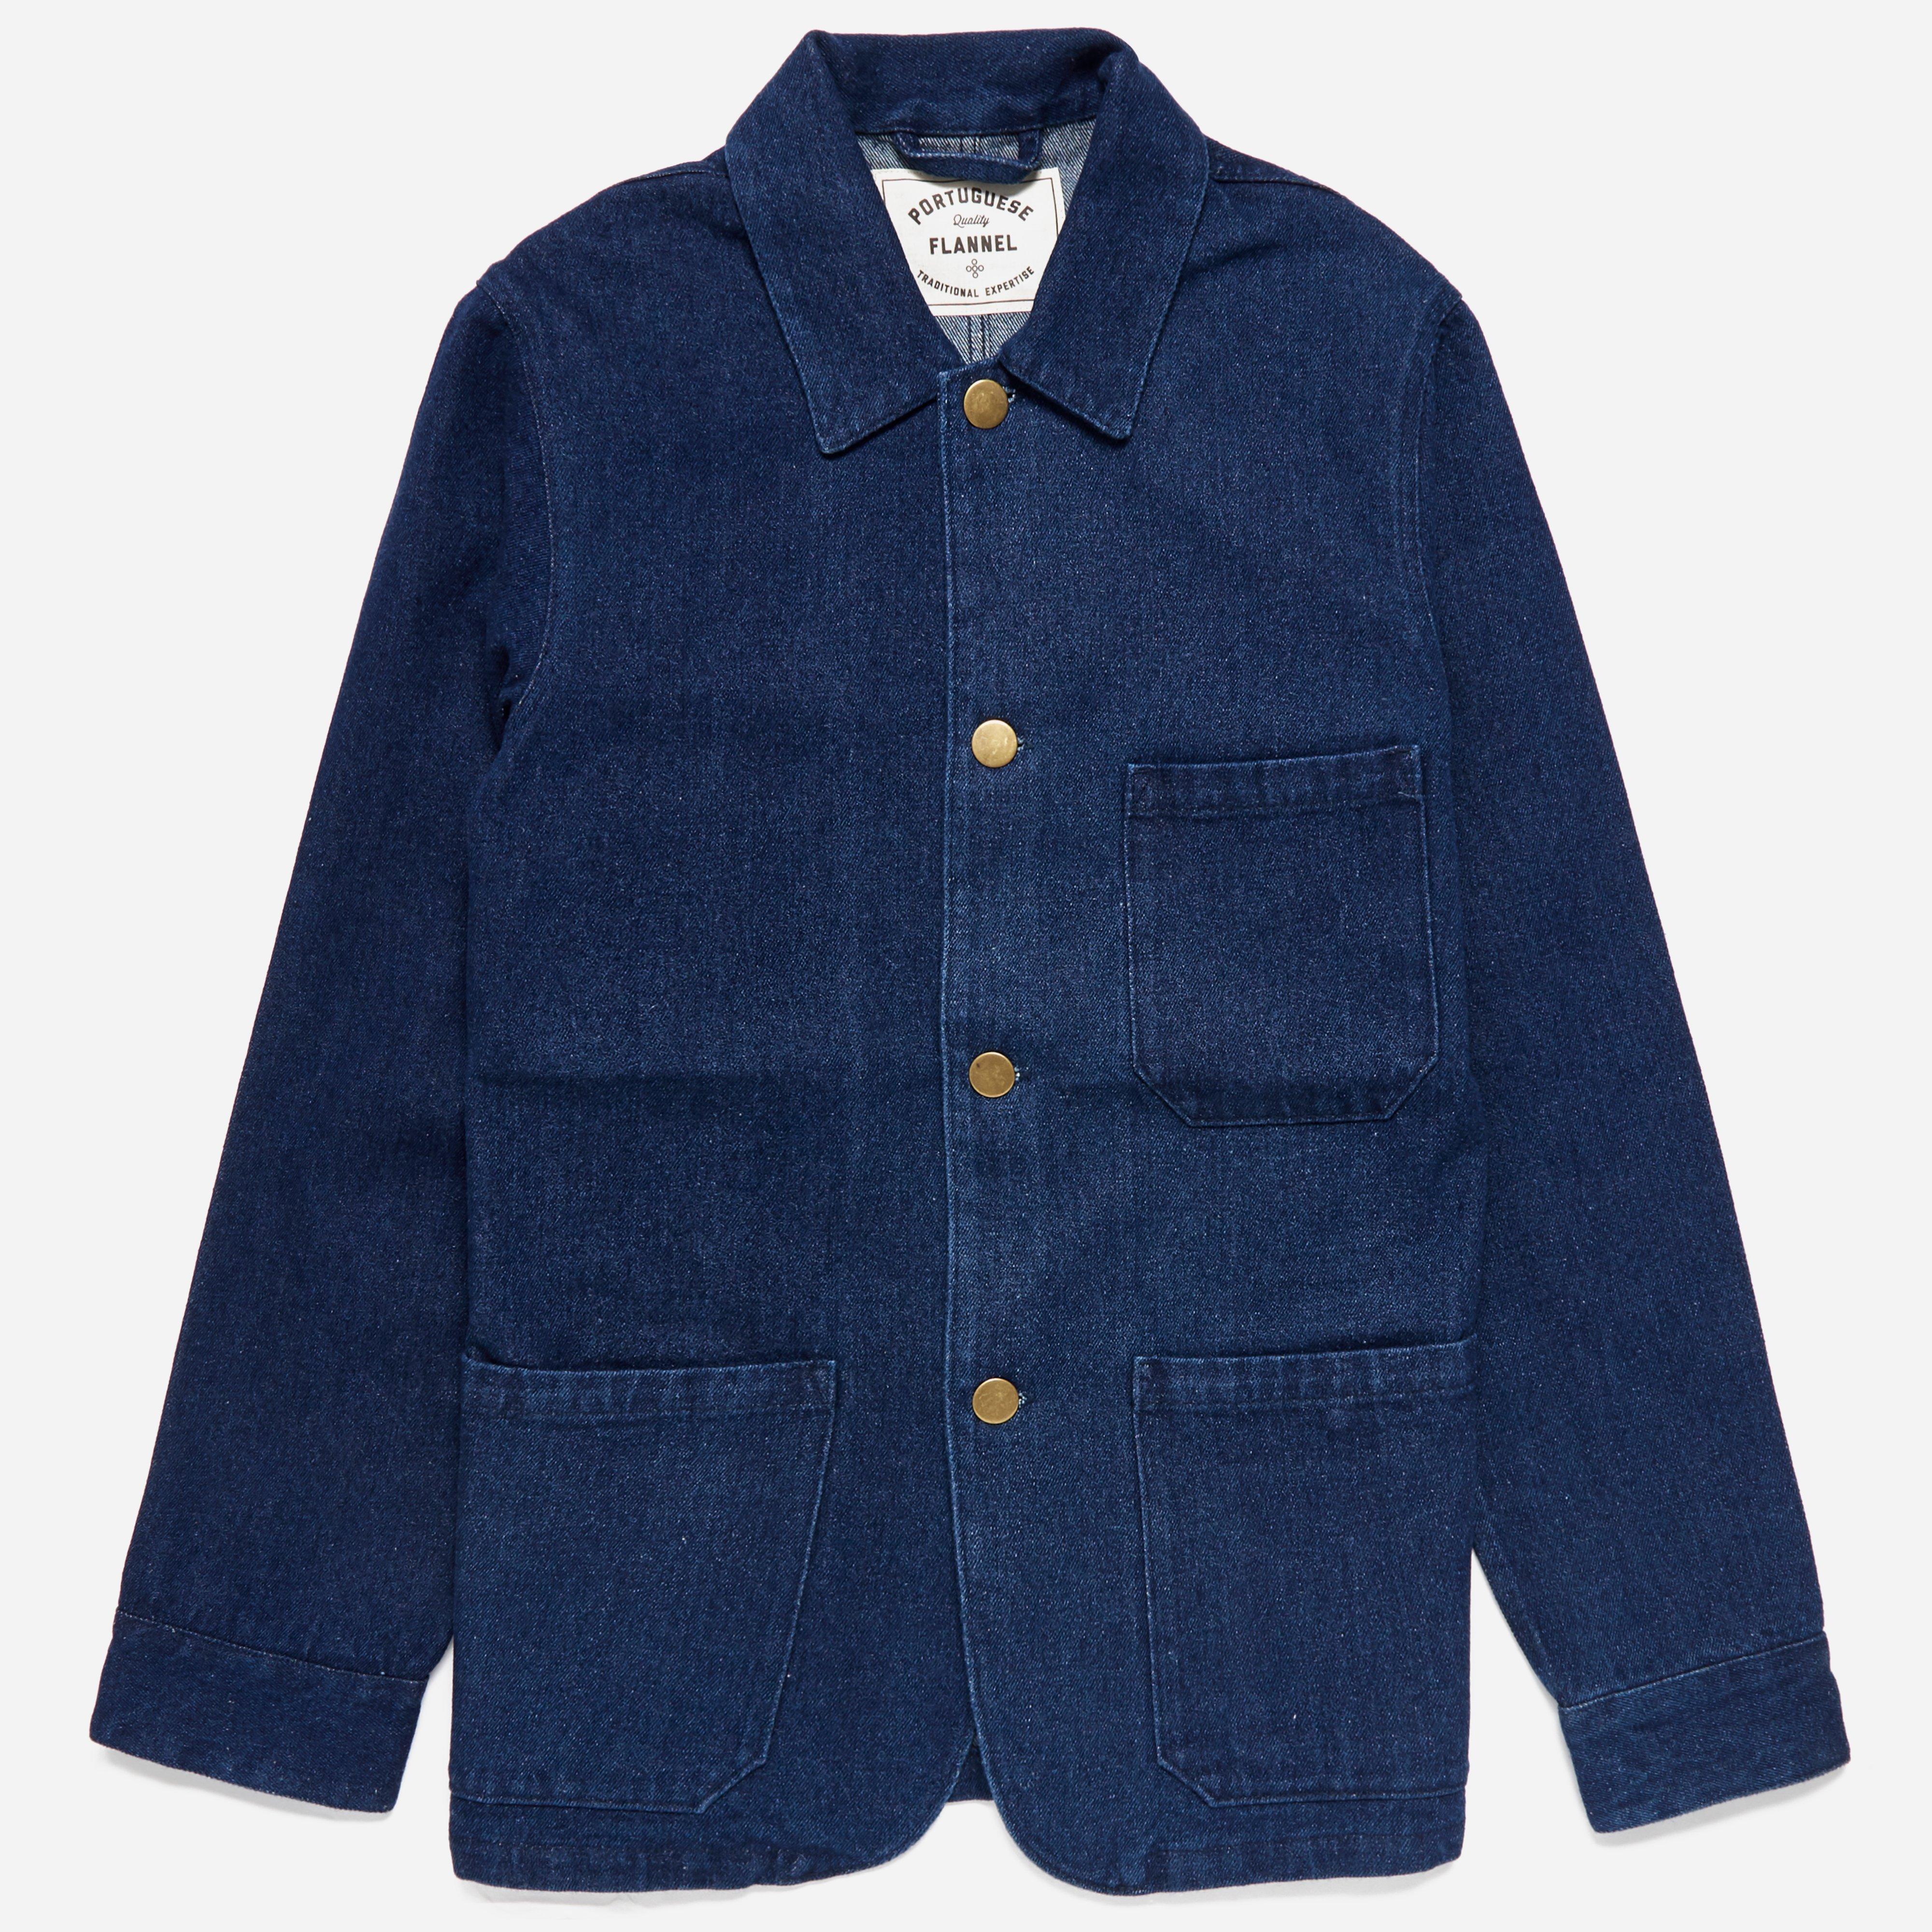 Portuguese Flannel Pinheiro Ganga Jacket